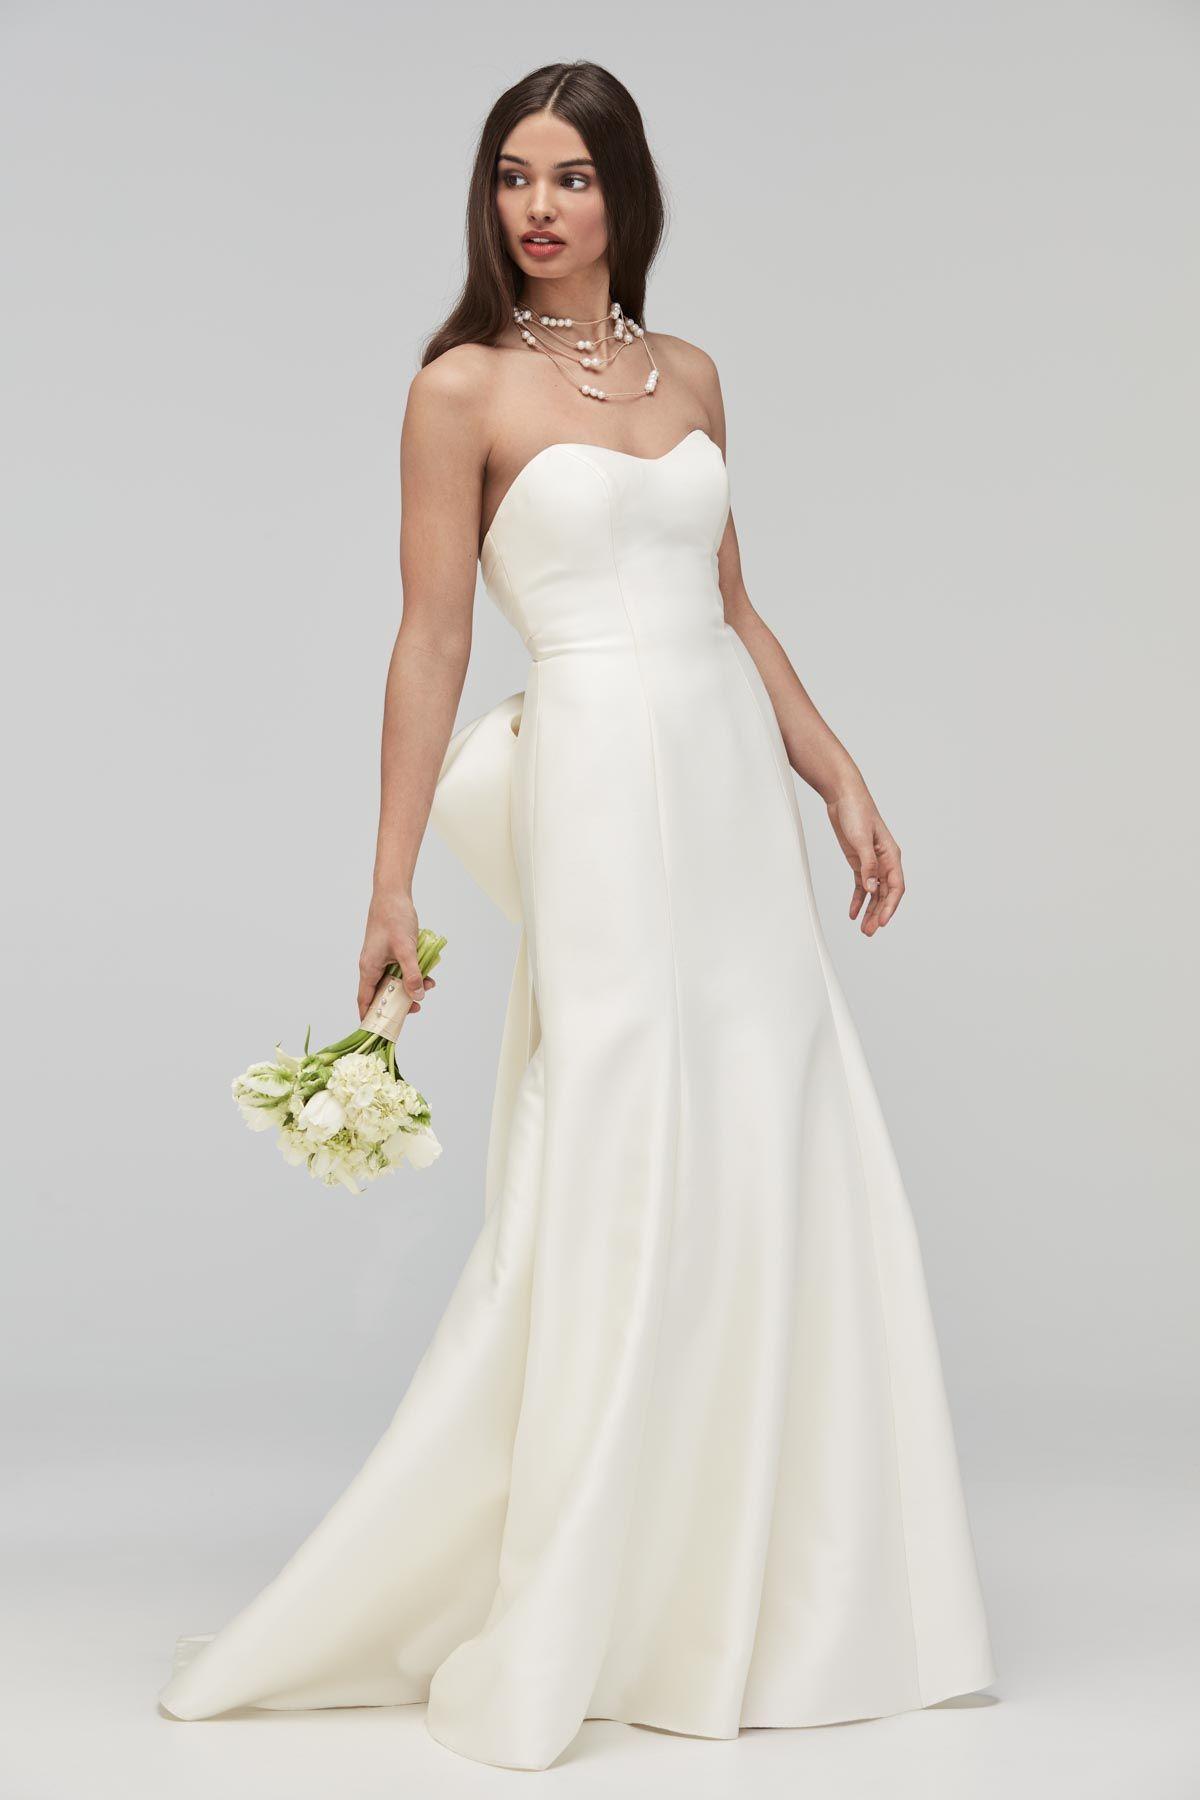 39+ Sample wedding dresses atlanta ideas